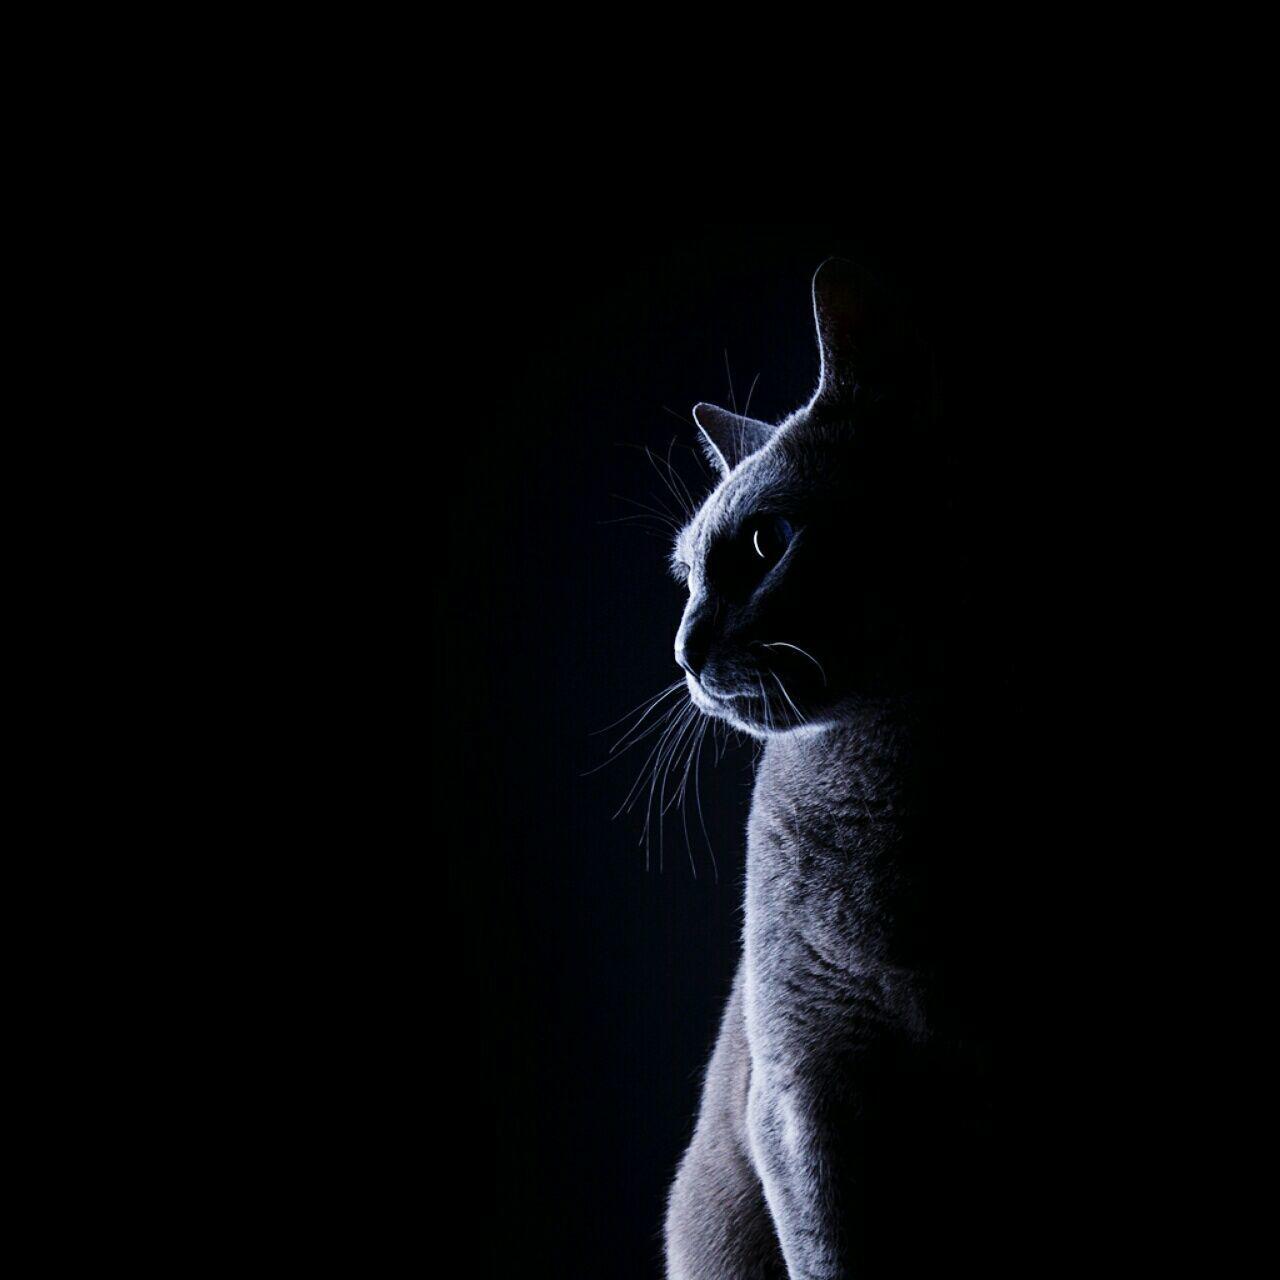 domestic cat, black background, pets, feline, one animal, domestic animals, animal themes, studio shot, dark, copy space, cat, whisker, animal head, sitting, mammal, no people, portrait, night, close-up, indoors, siamese cat